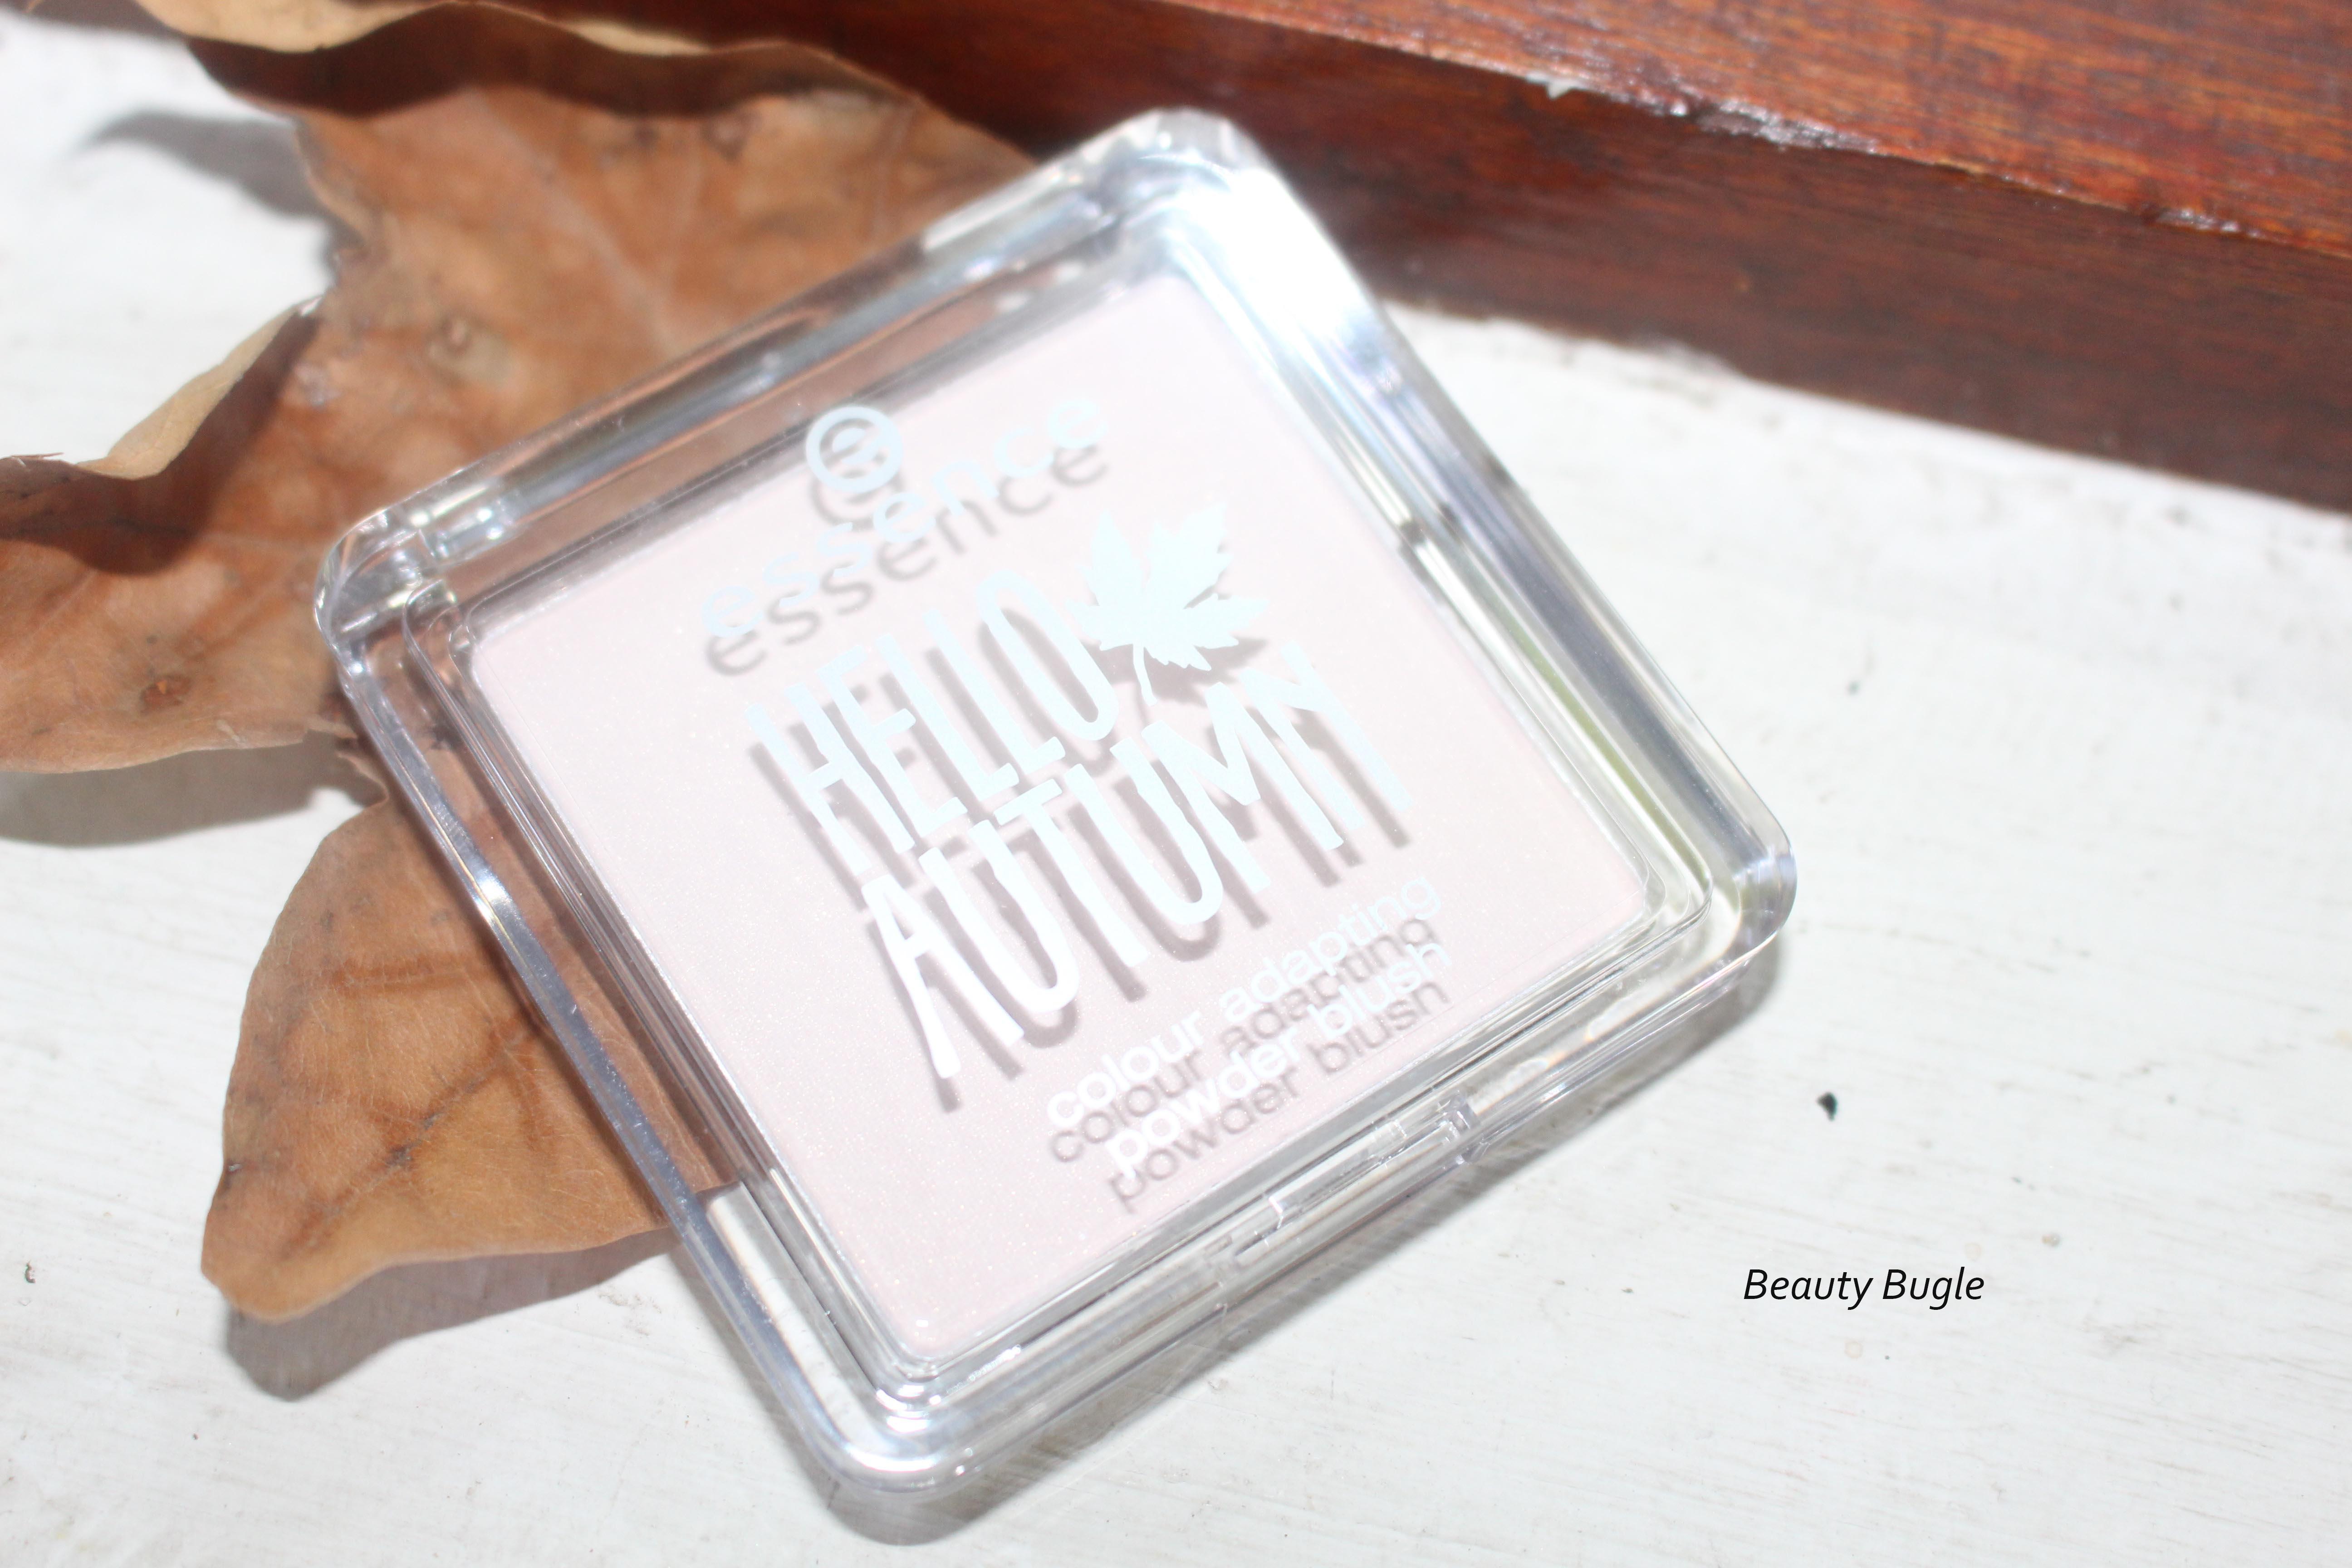 Essence Hello Autumn Beautifall-Red Colour adapting powder blush.